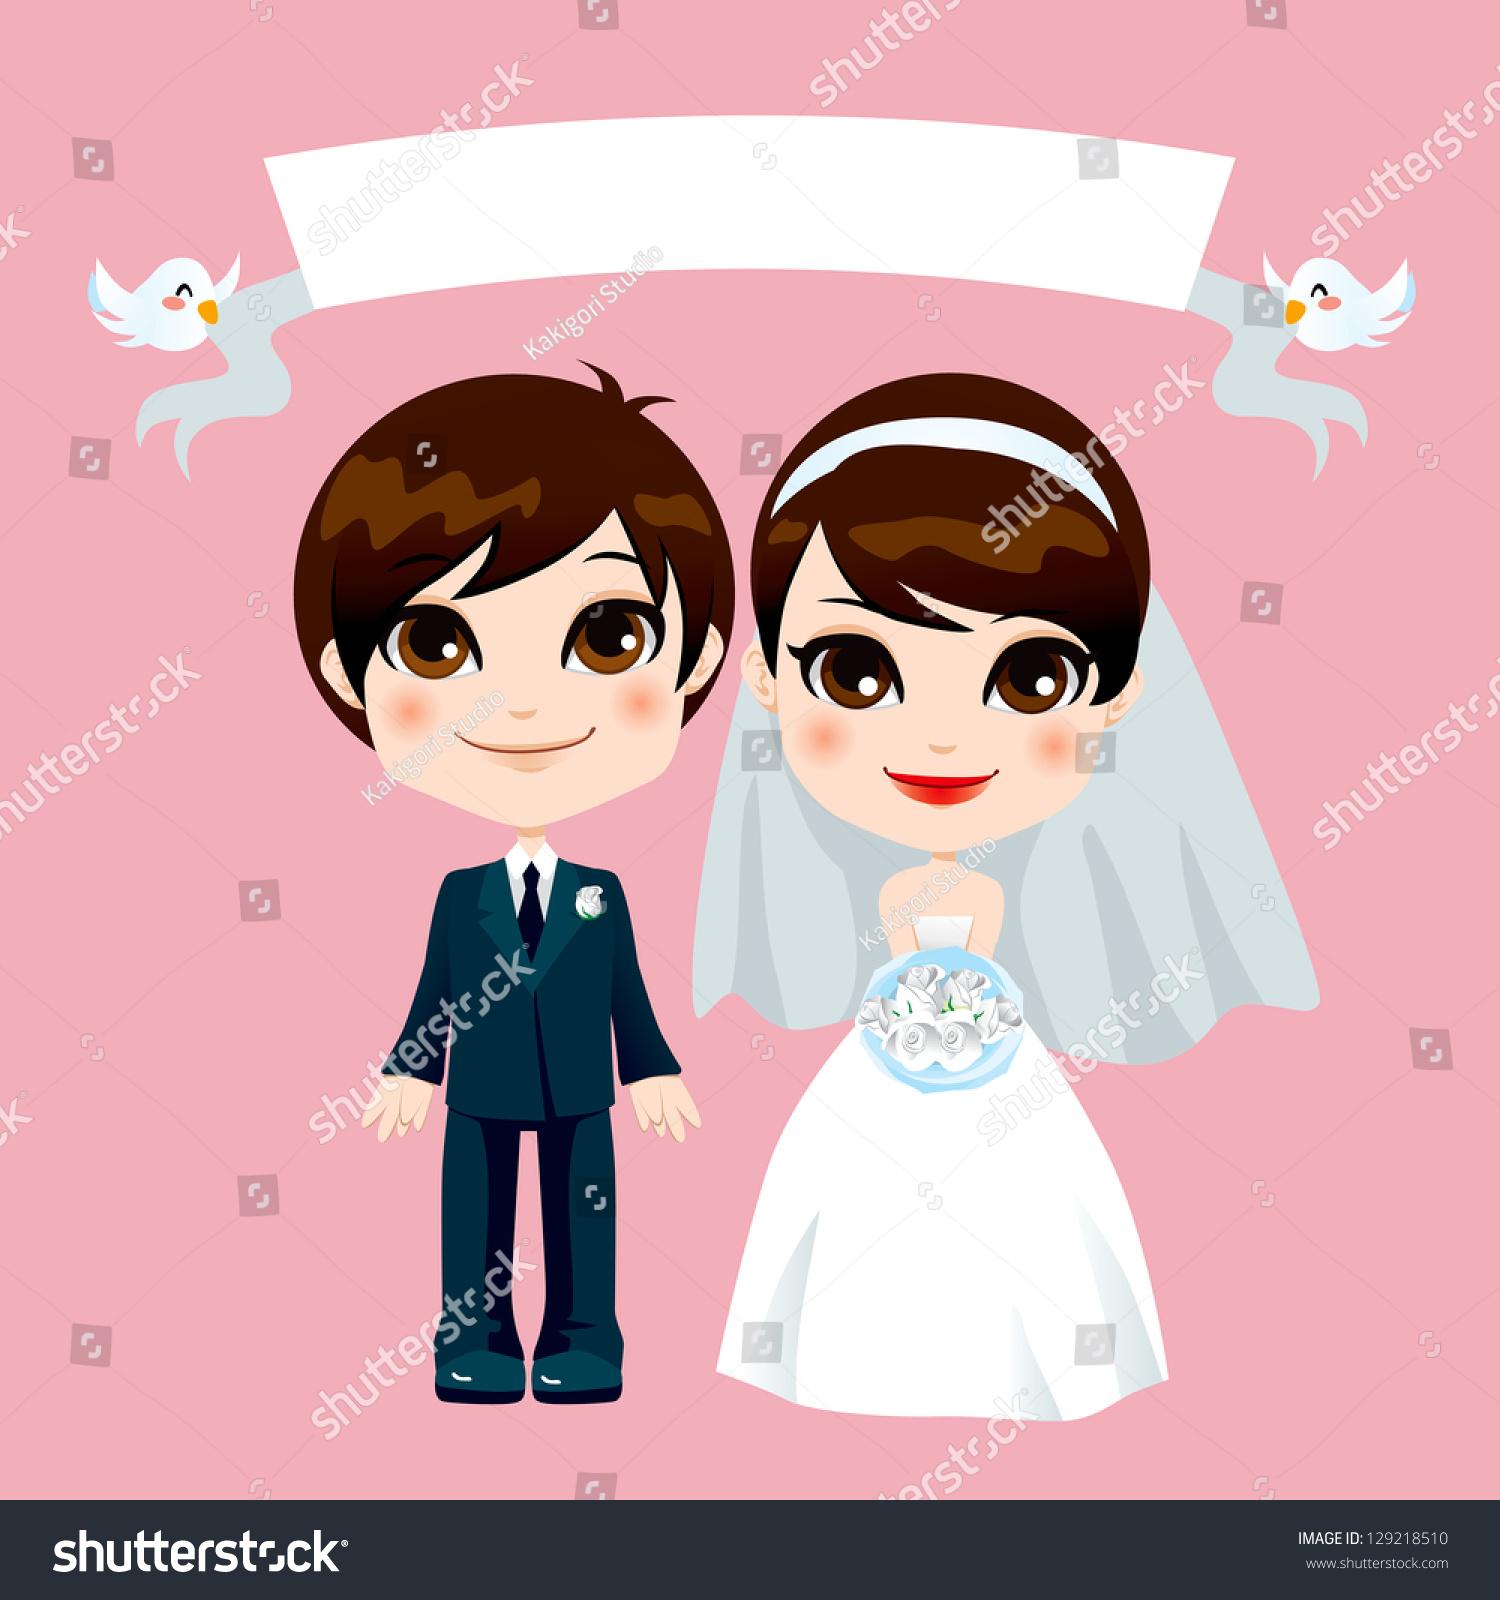 Illustration Lovely Sweet Couple Wedding Empty Stock Vector ...